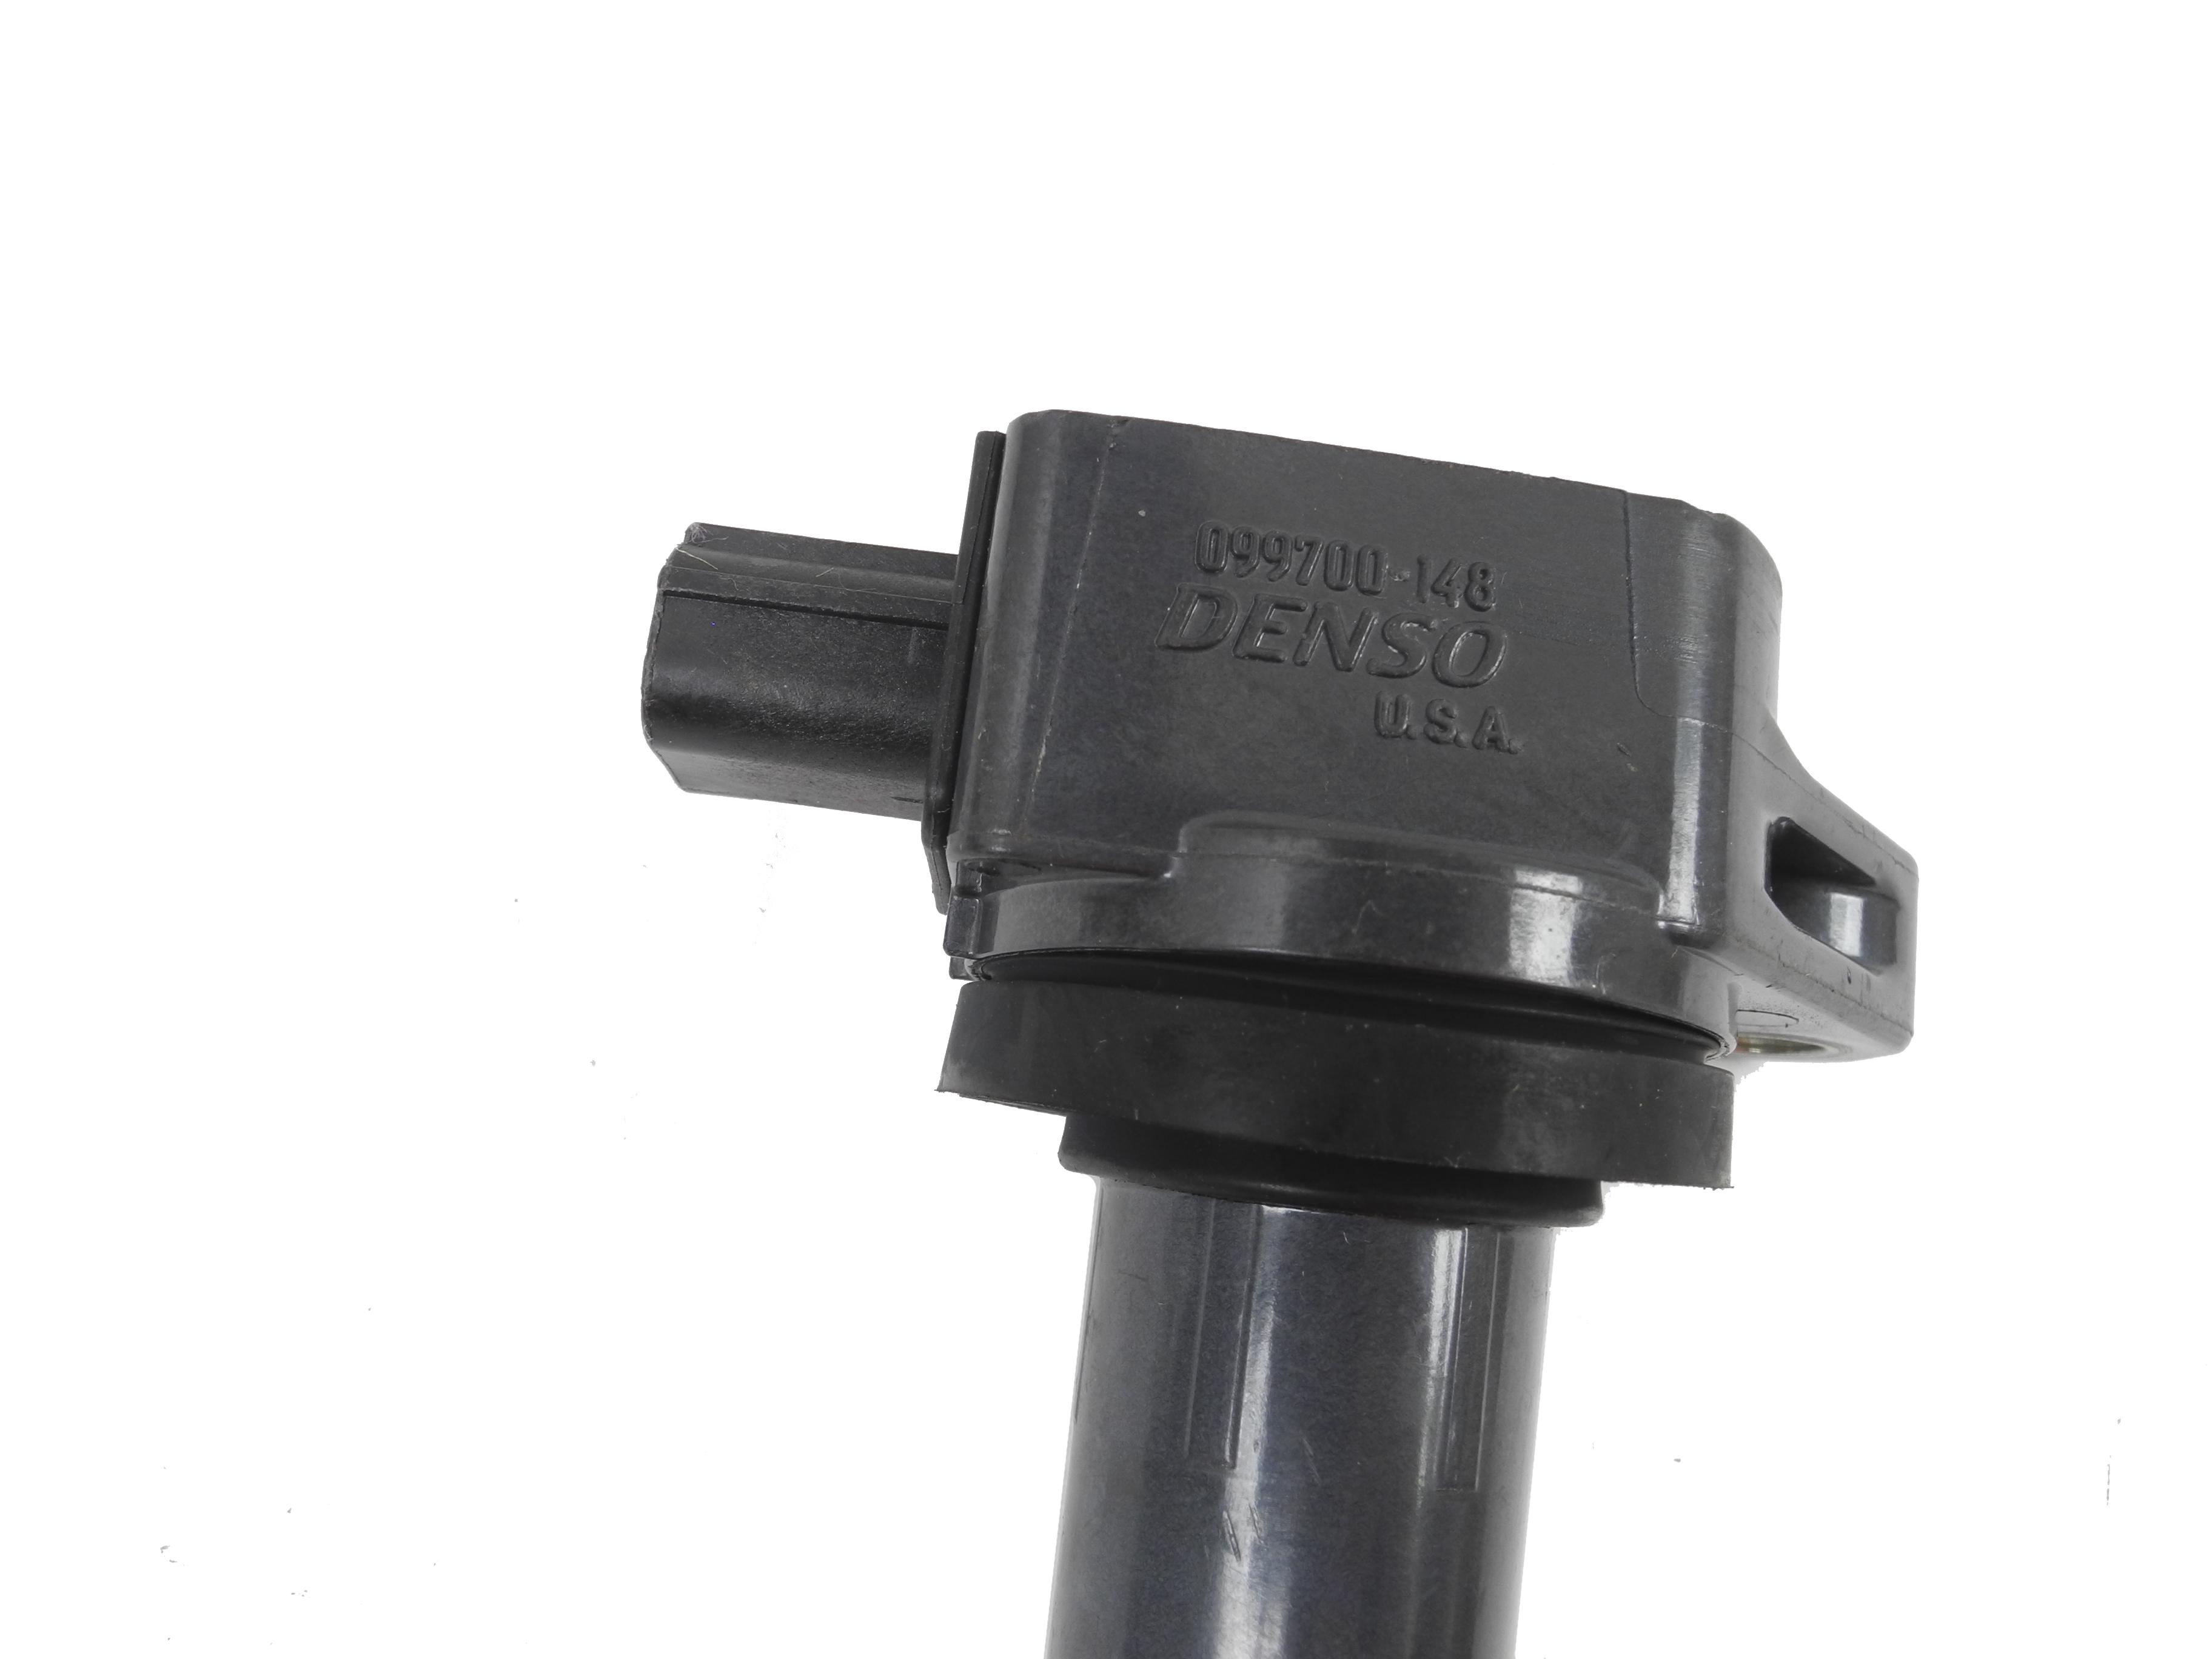 UF602 4x New OEM Ignition Coil for Honda Accord 08-2011 CRV 2010-2011 2.4L C1662